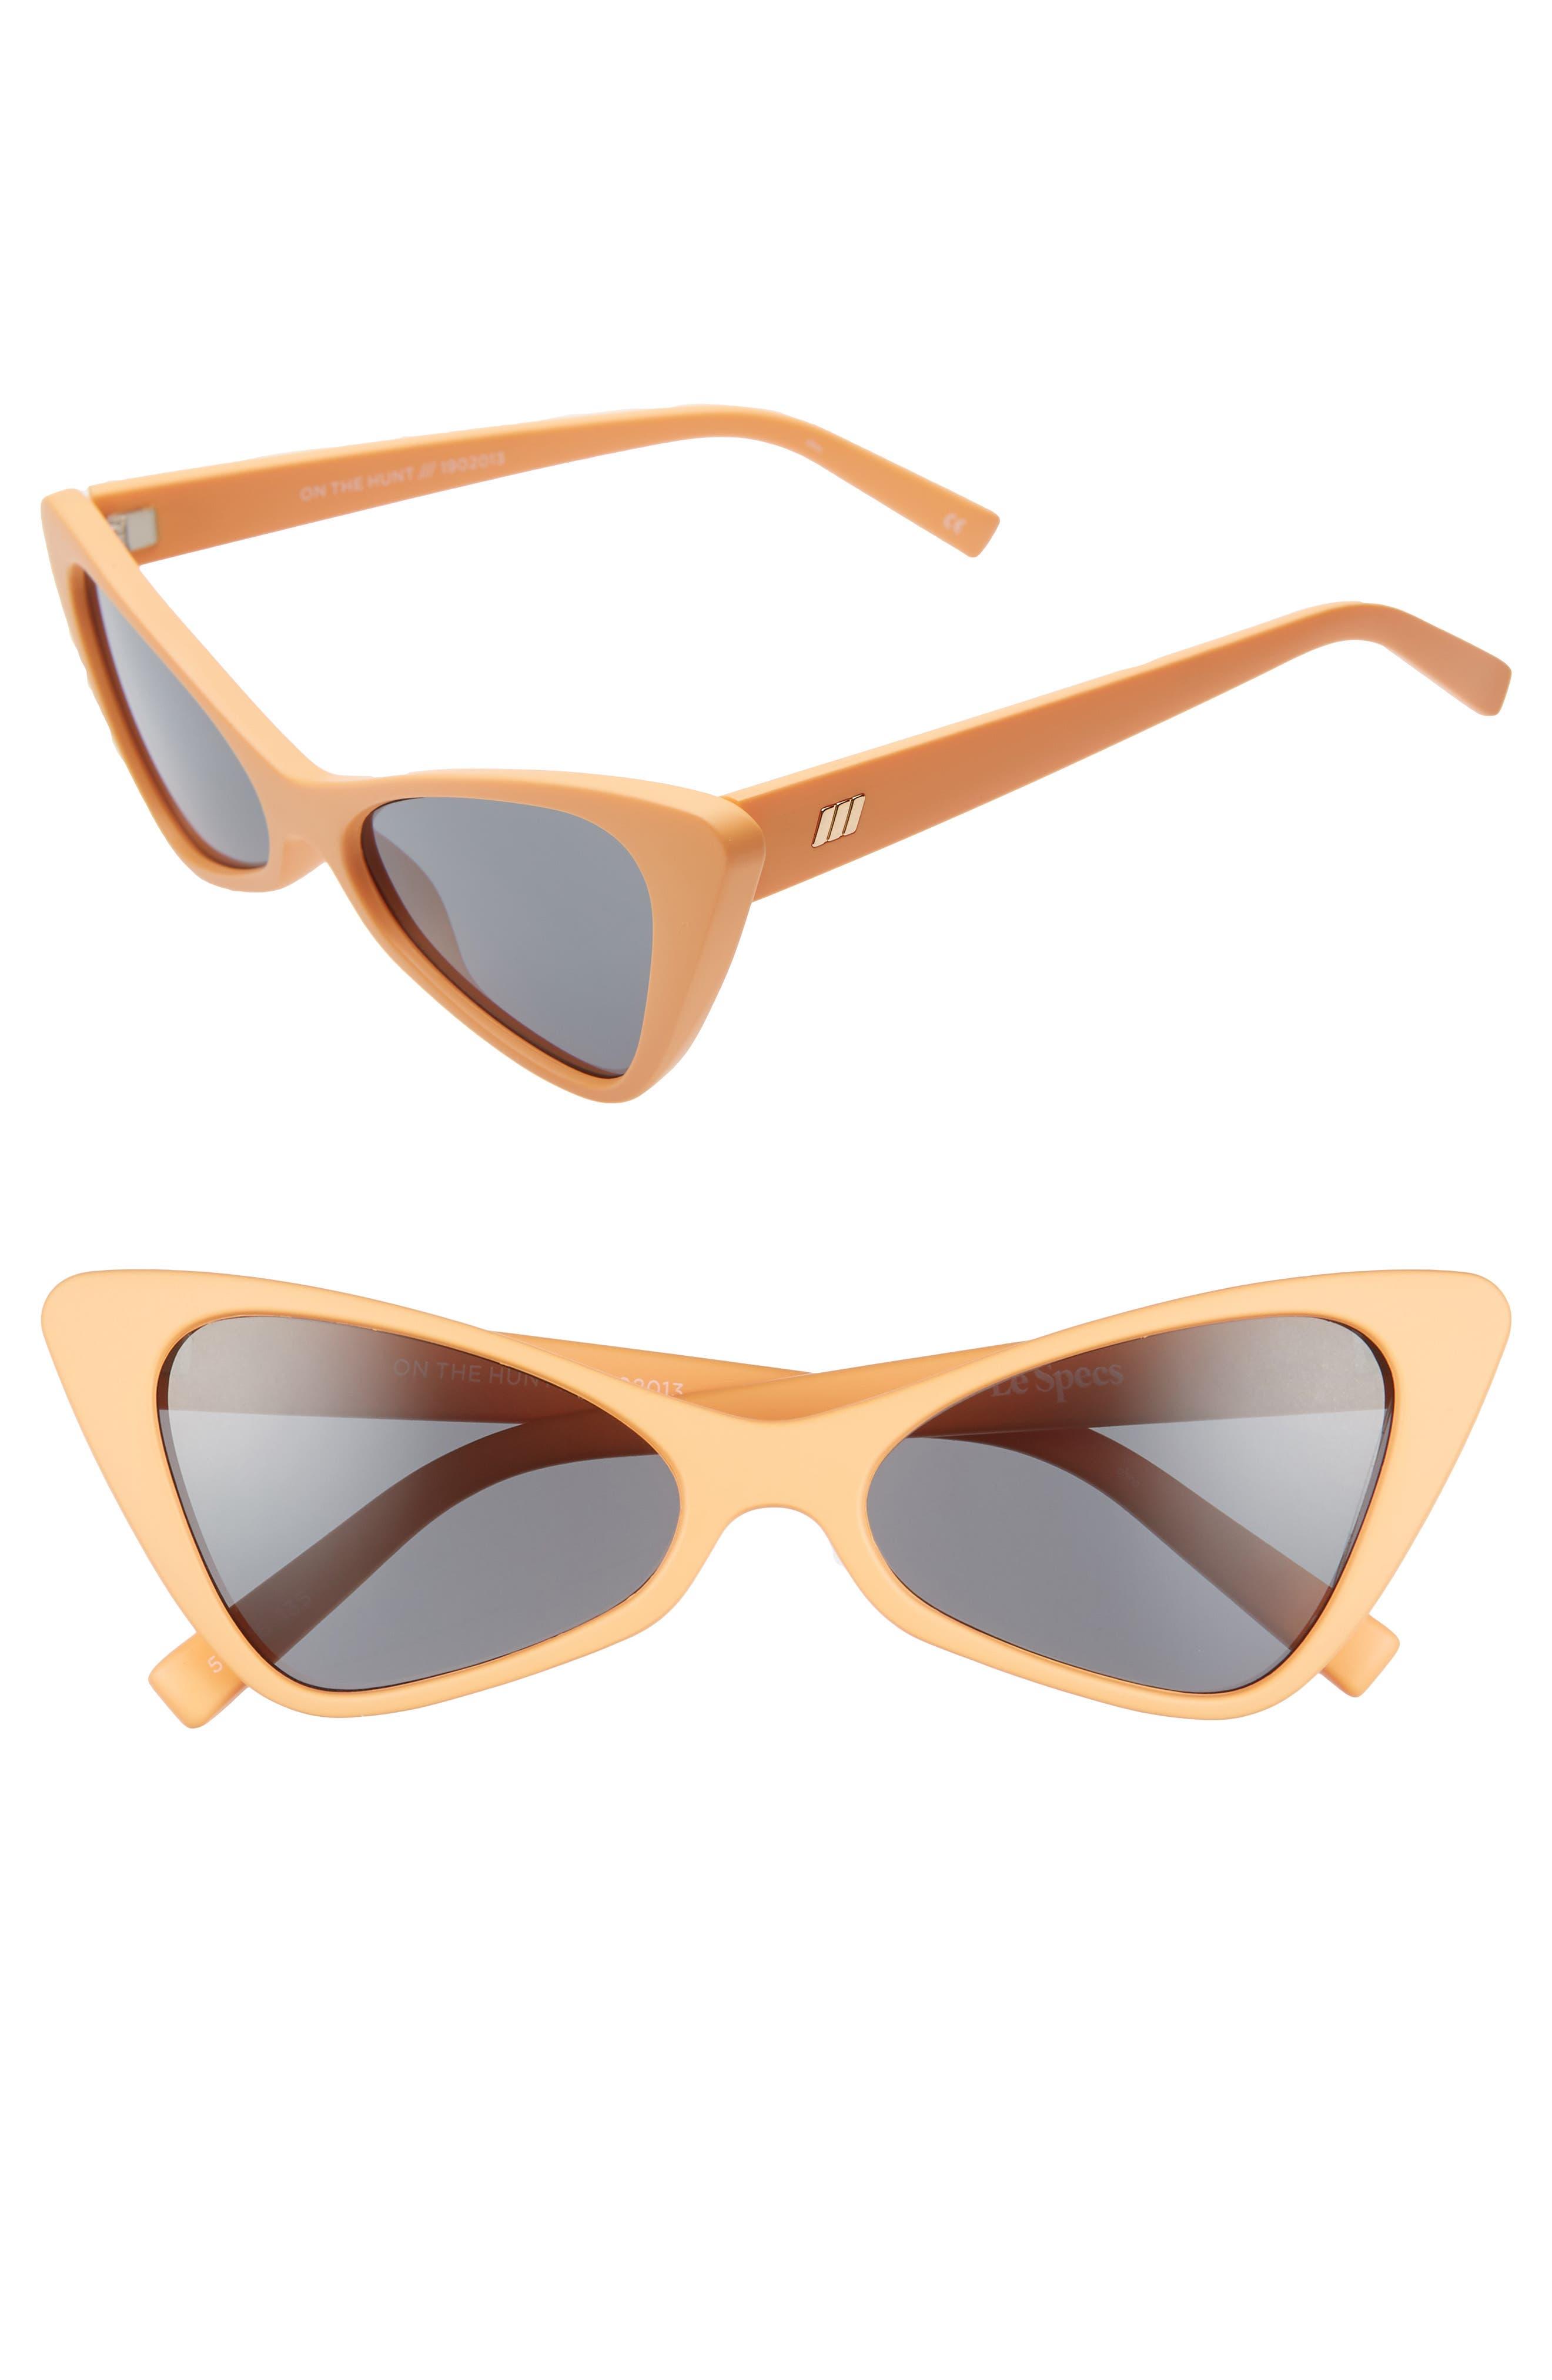 Le Specs On The Hunt 5m Cat Eye Sunglasses - Peach Sherbet/ Smoke